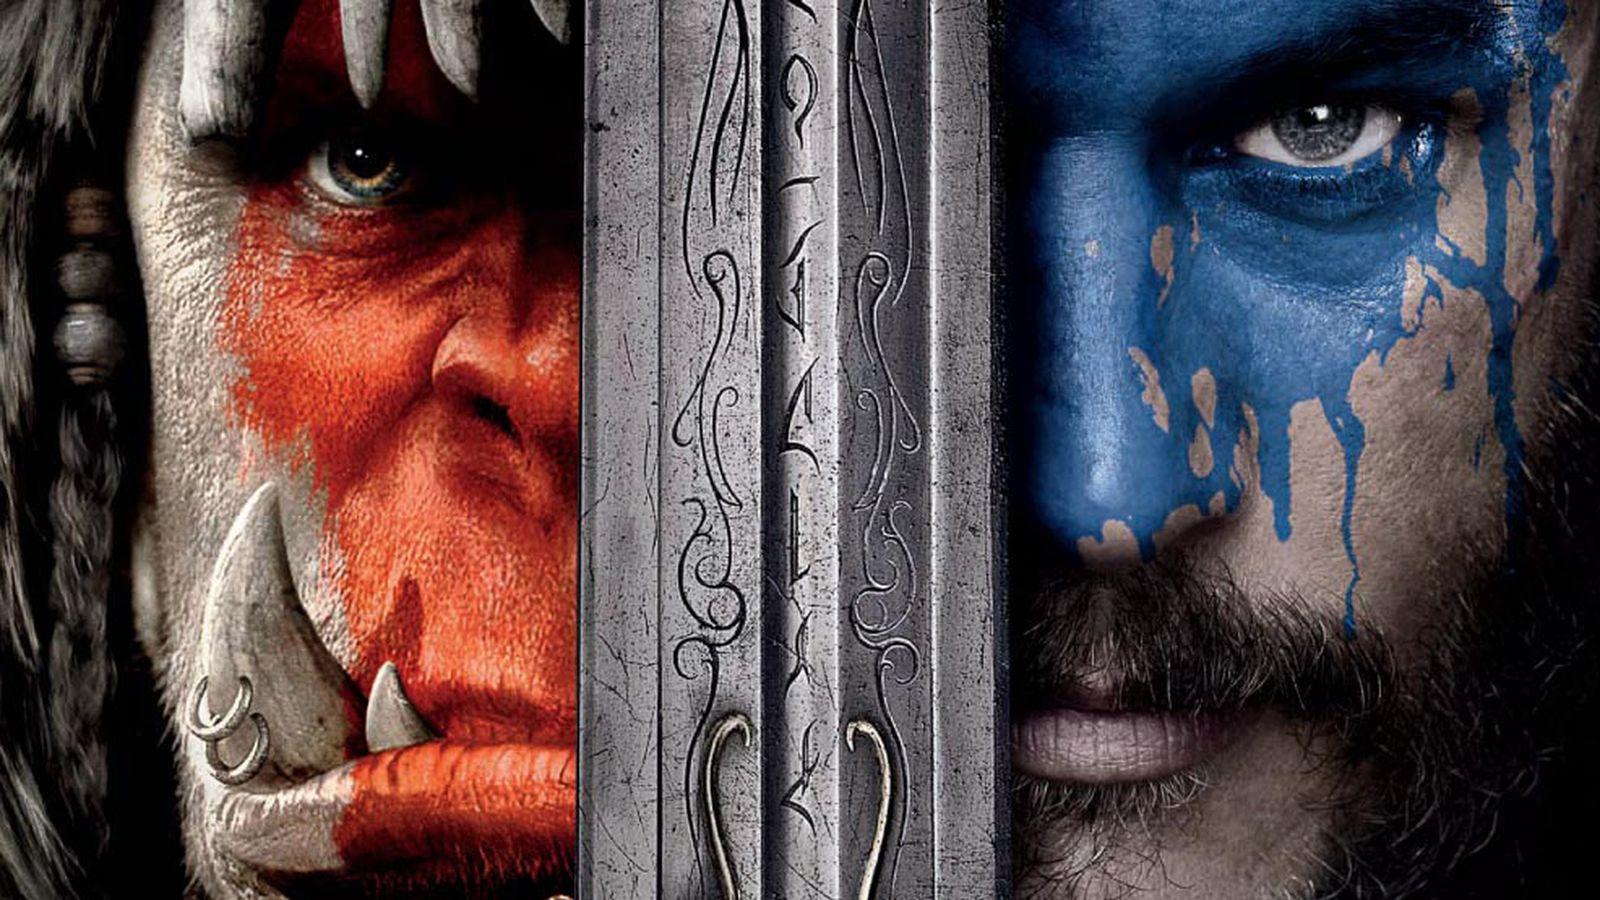 Warcraft Početak film recenzija